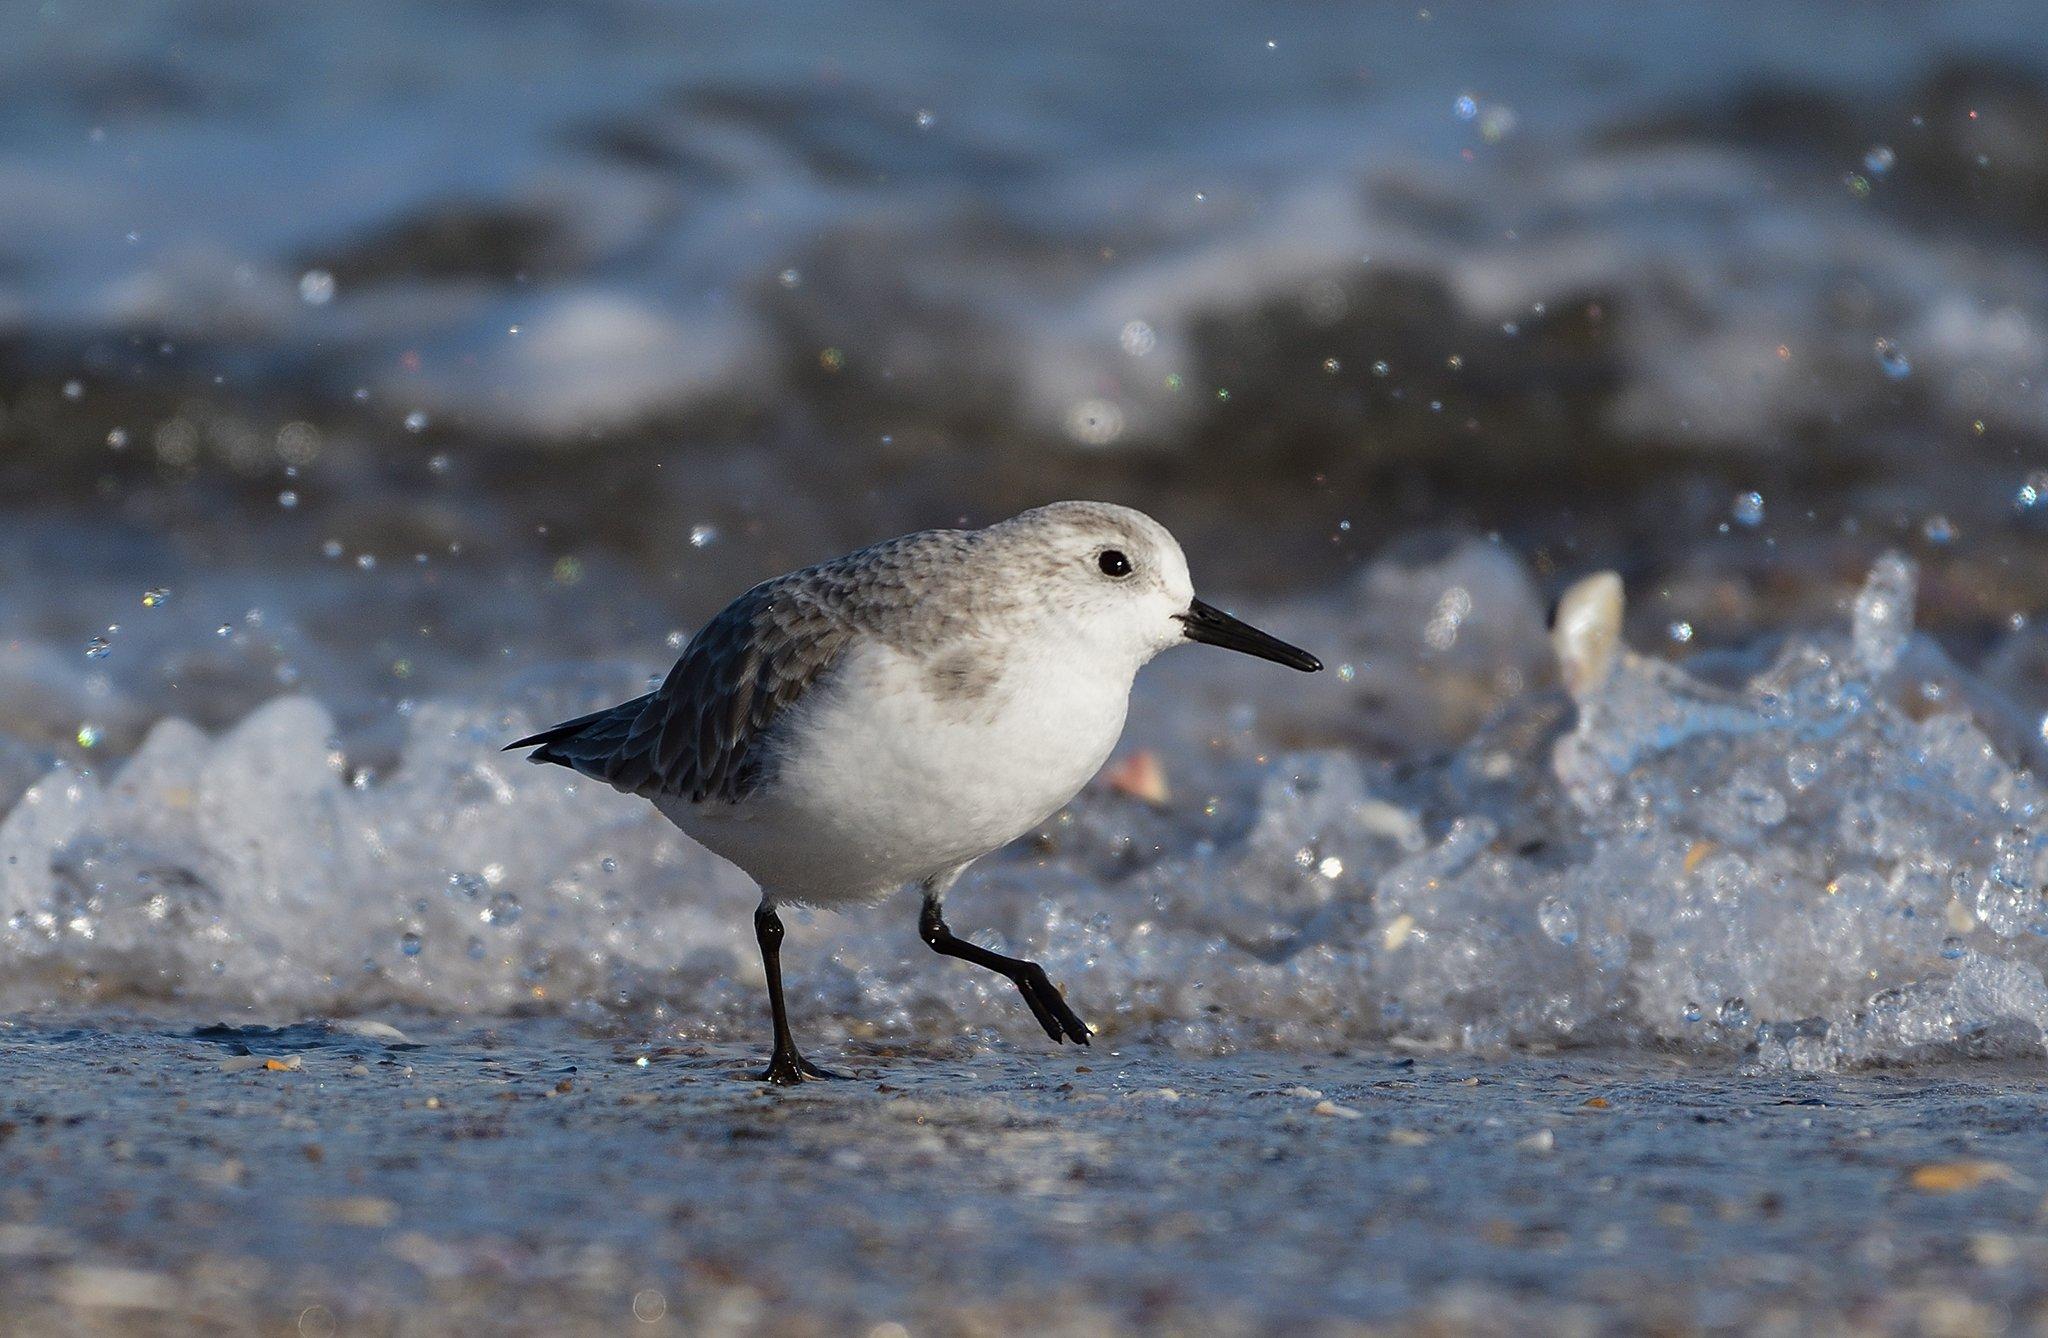 bird, birds, beach, seaside, shoreline, sea, water, animal, animals, sanderling, birdwatching, birding, Димитър Русев